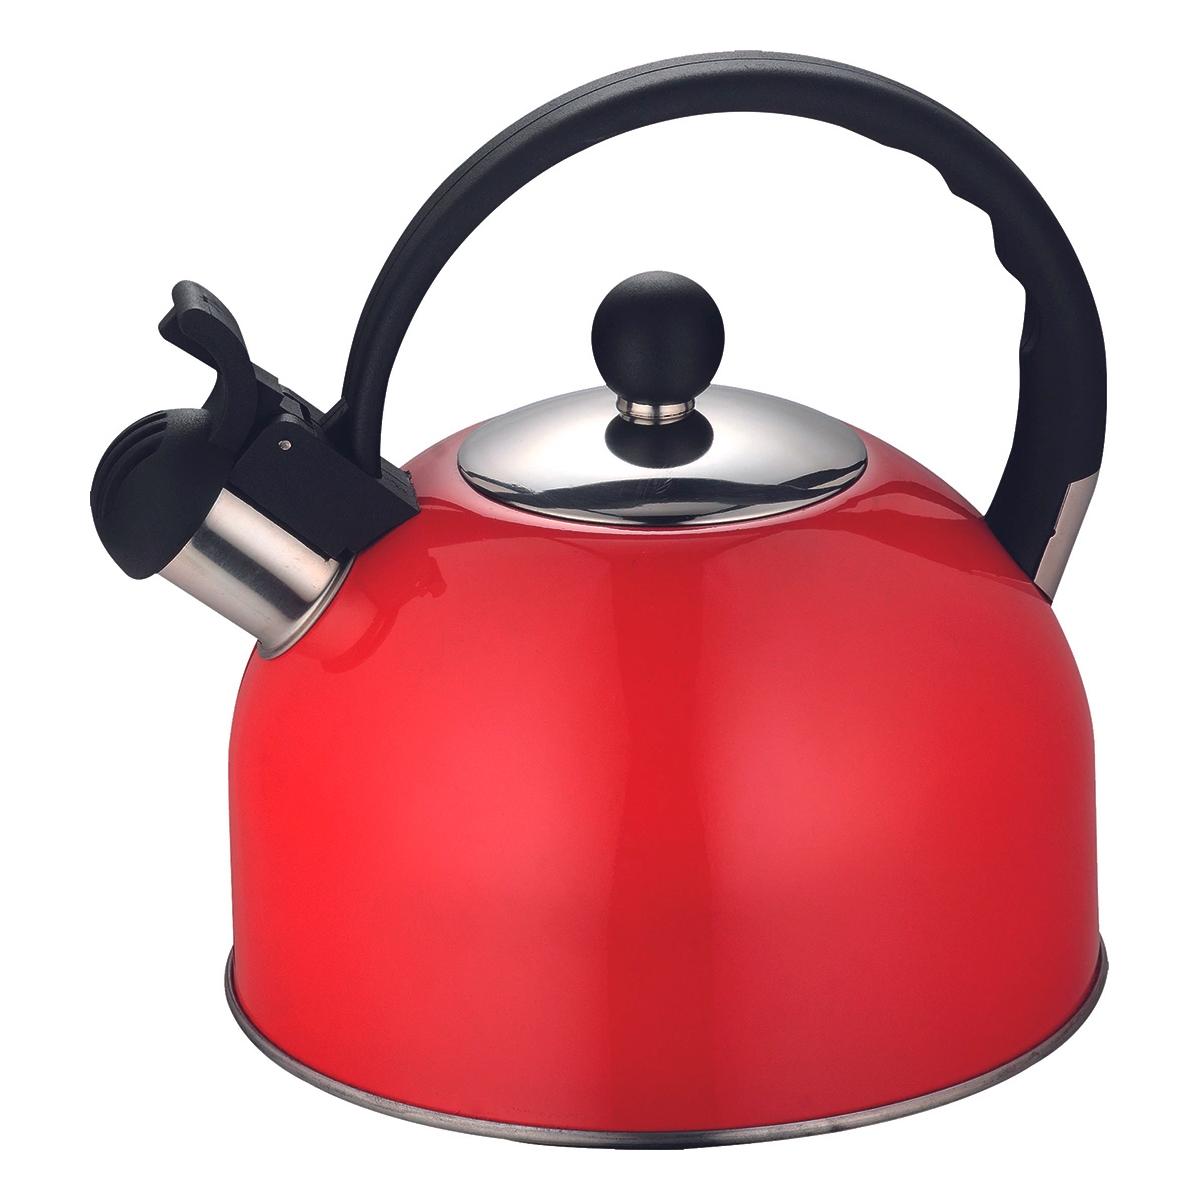 Чайник 2,5 л Colorfest Hitt сочный гранат